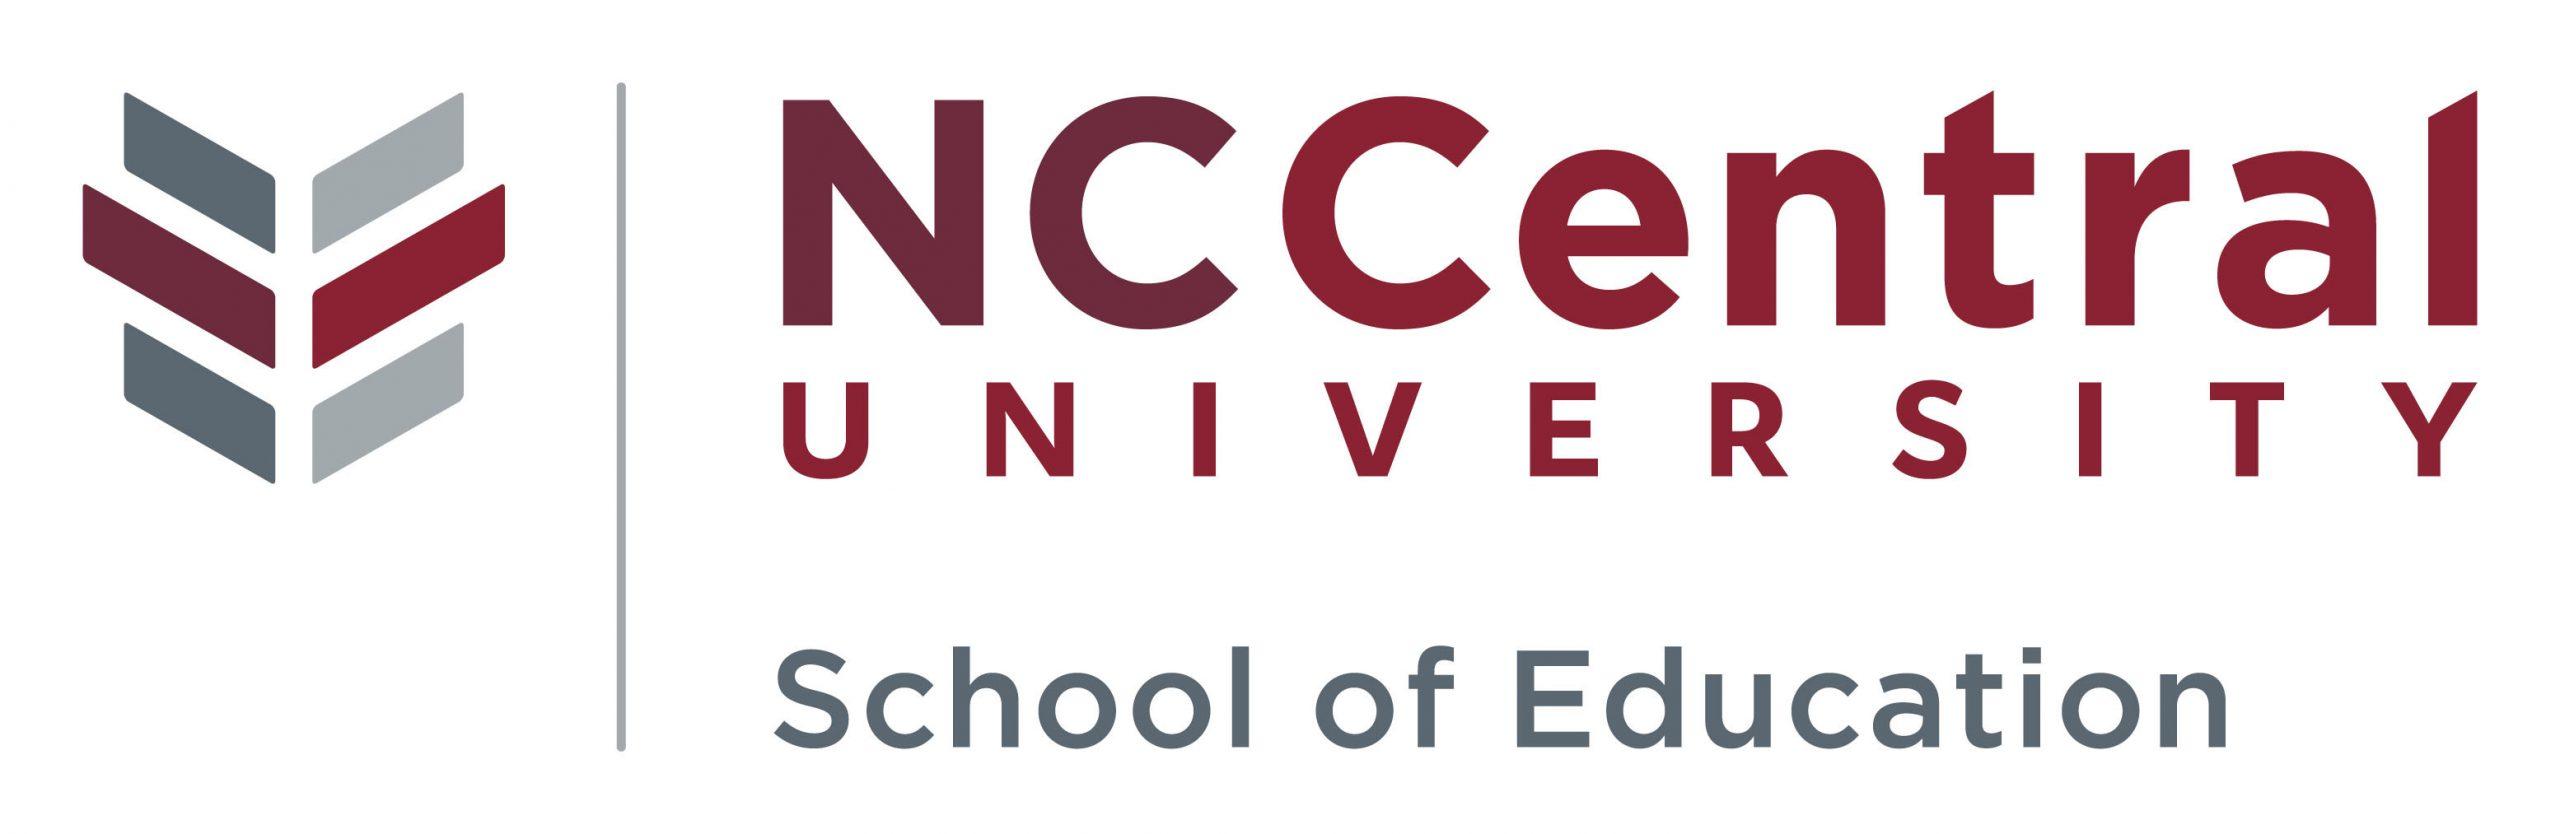 NC Central School of Education logo